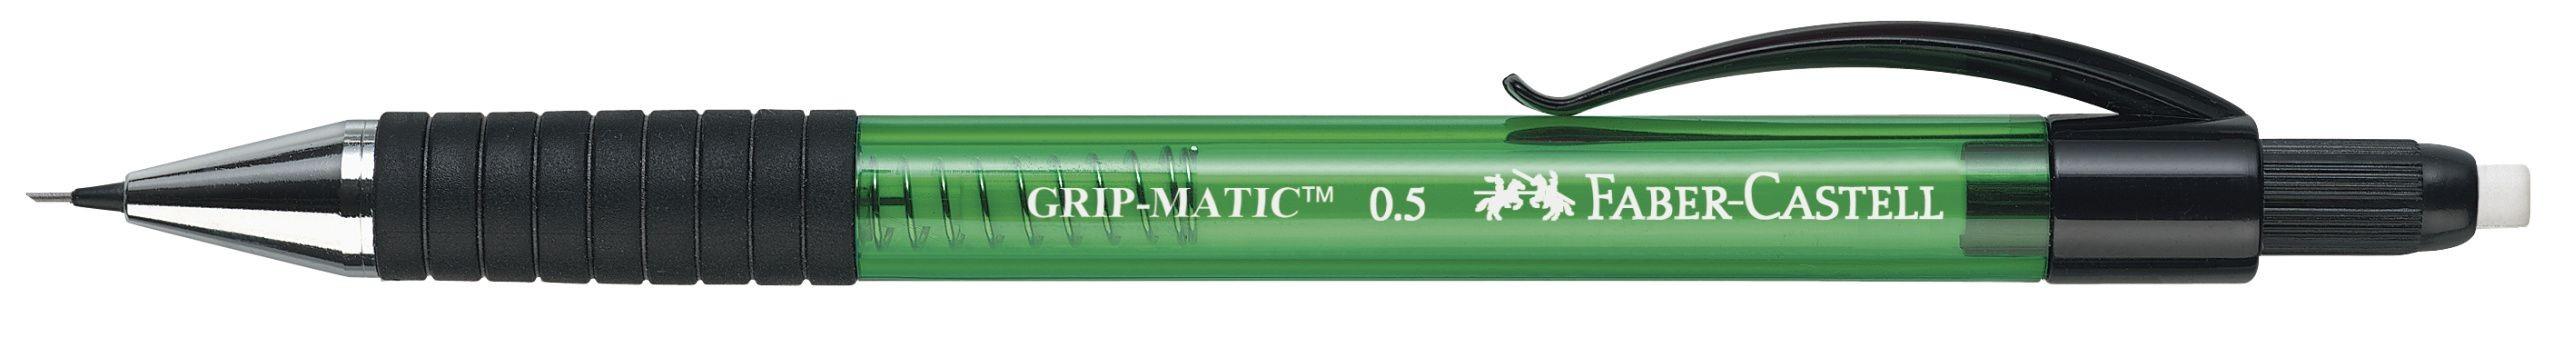 CREION MECANIC 0.5MM VERDE GRIP-MATIC 1375 FABER-CASTELL